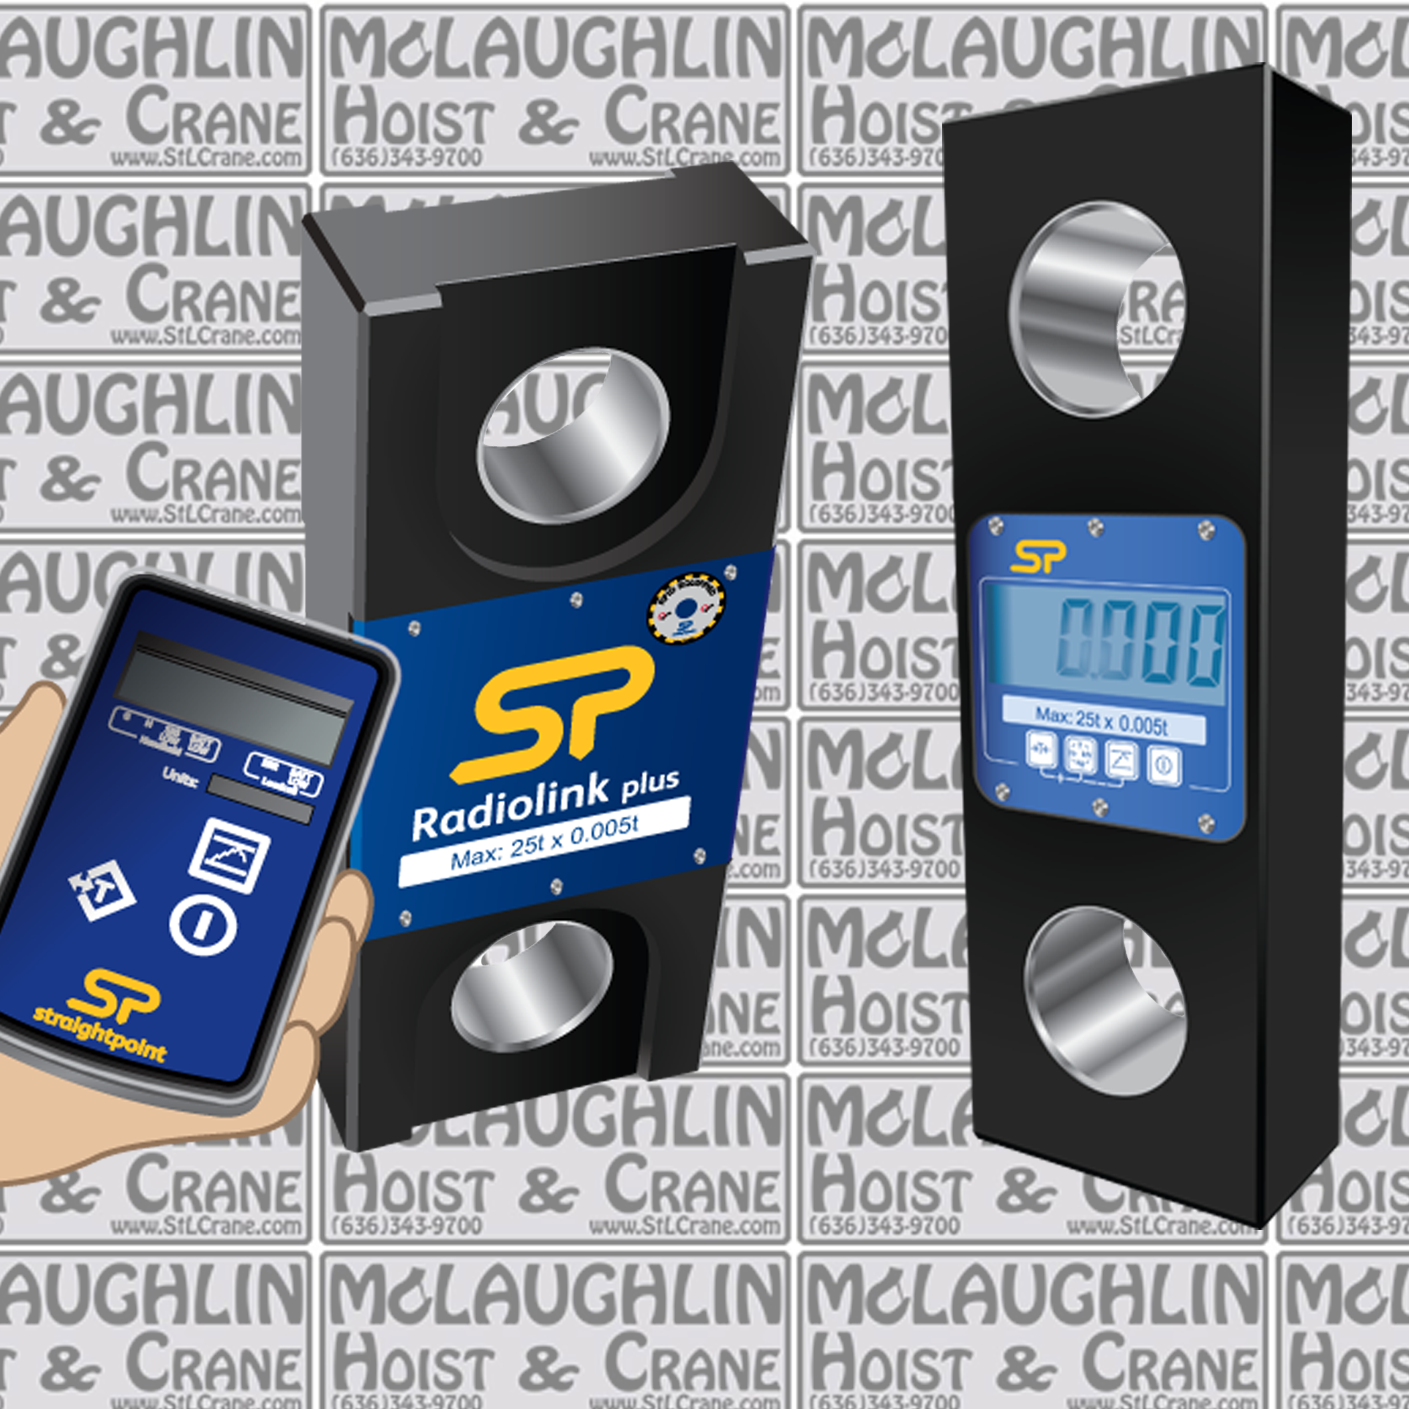 StraightPoint LoadLink Plus Electronic Dynomometer